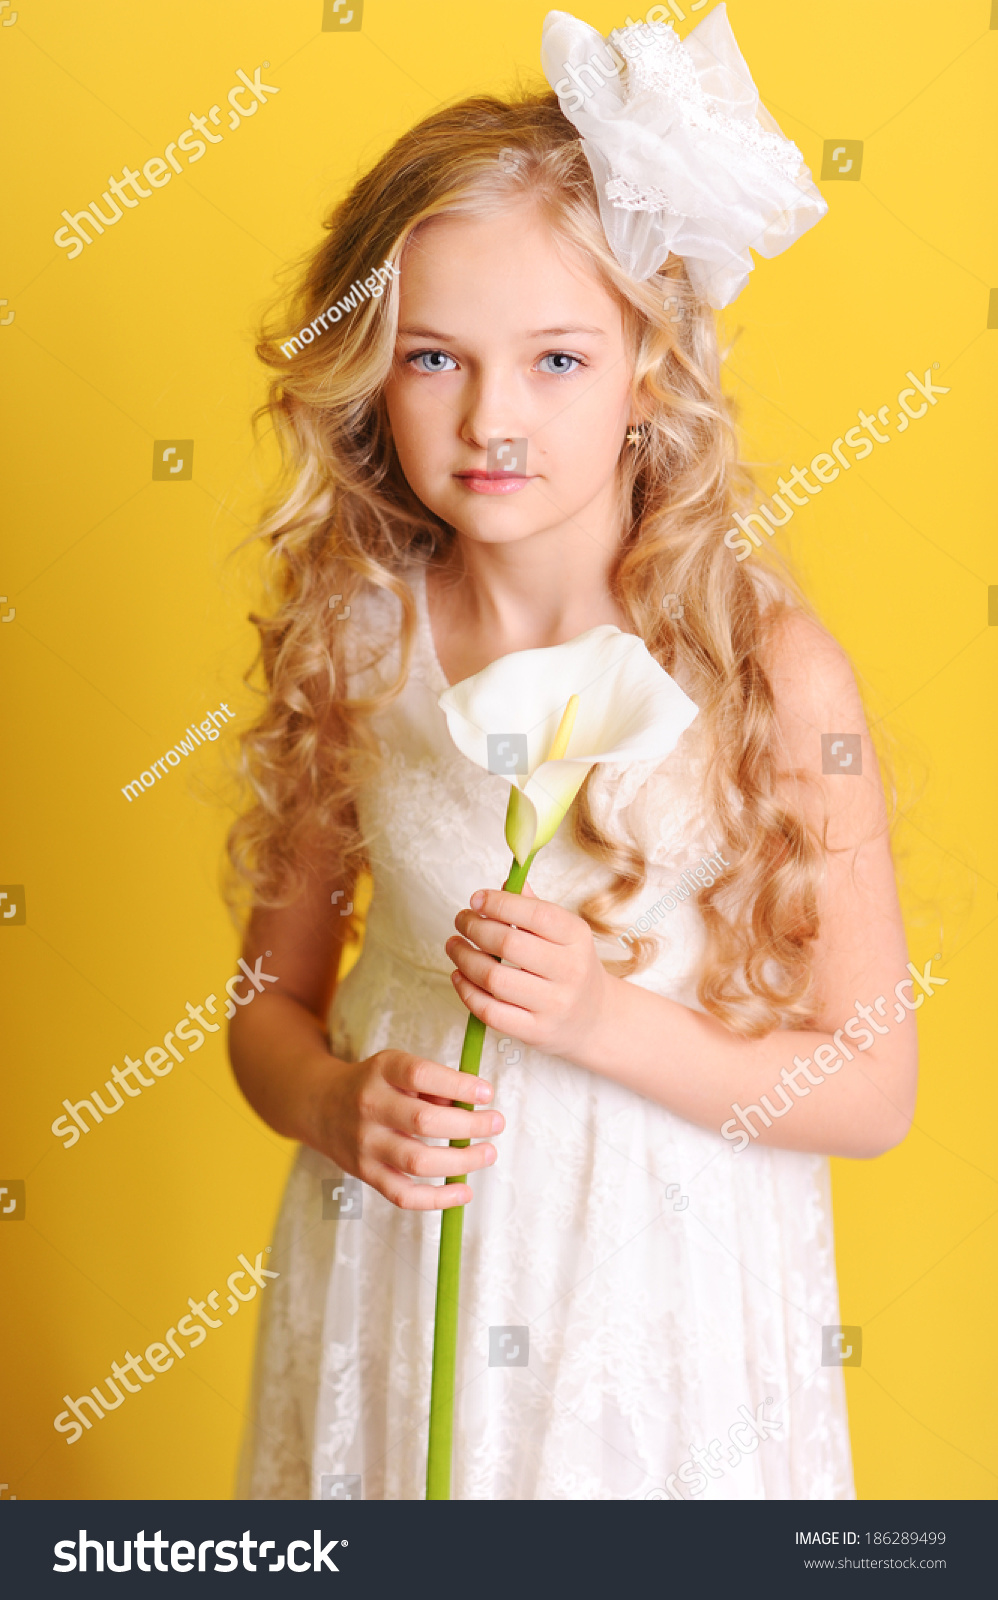 Cute Kid Girl 1012 Year Old Stock Photo 186289499 - Shutterstock